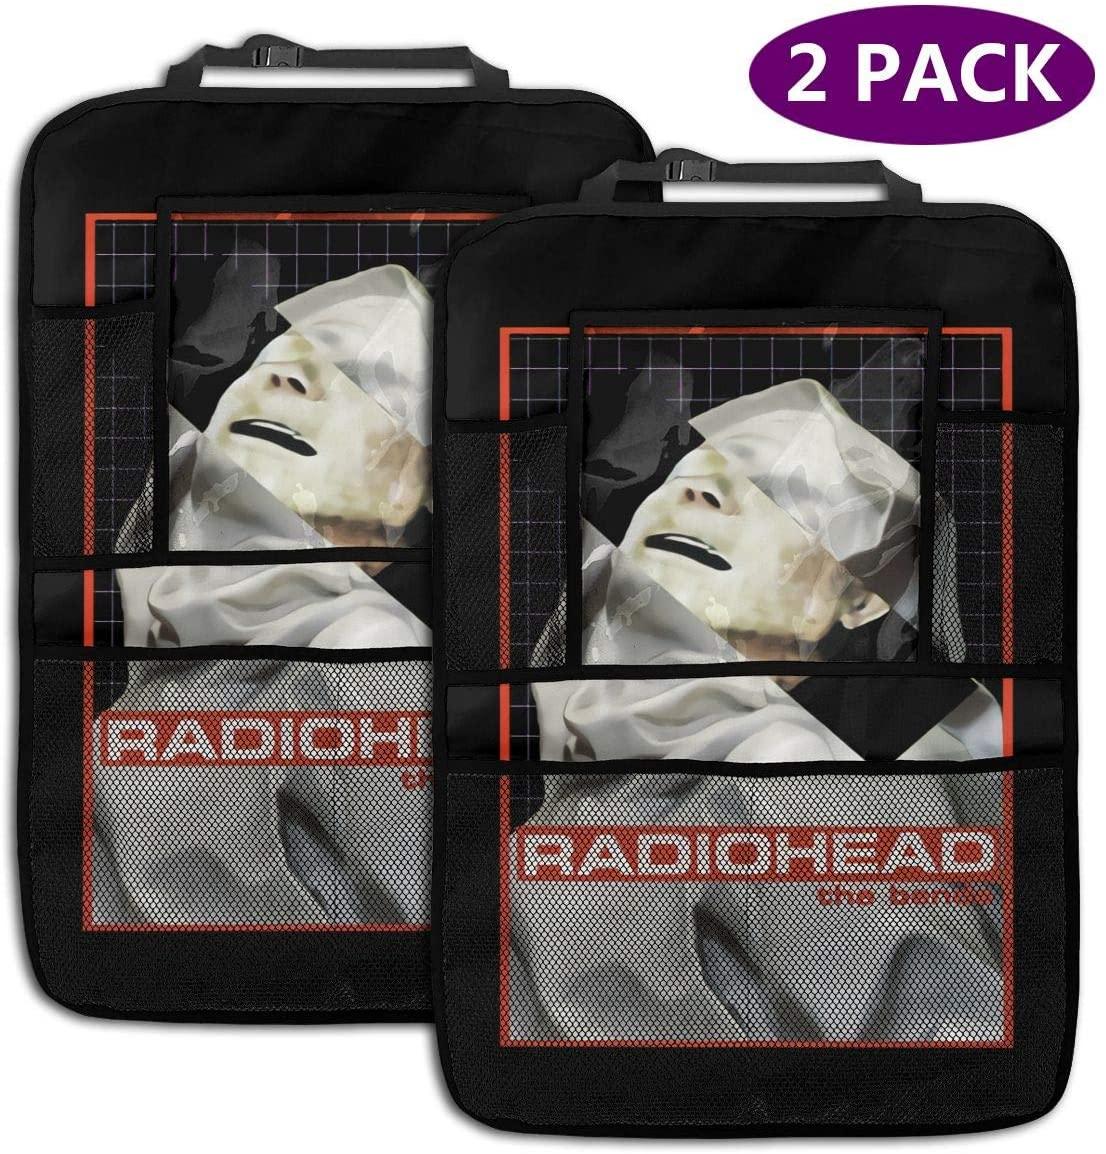 Backseat Car Organizer Radiohead+The+ Bends Seamless Vector Background 2 Pack Car Seat Organizer Waterproof Durable Multi Pocket Back Seat Storage Bag Travel Accessories